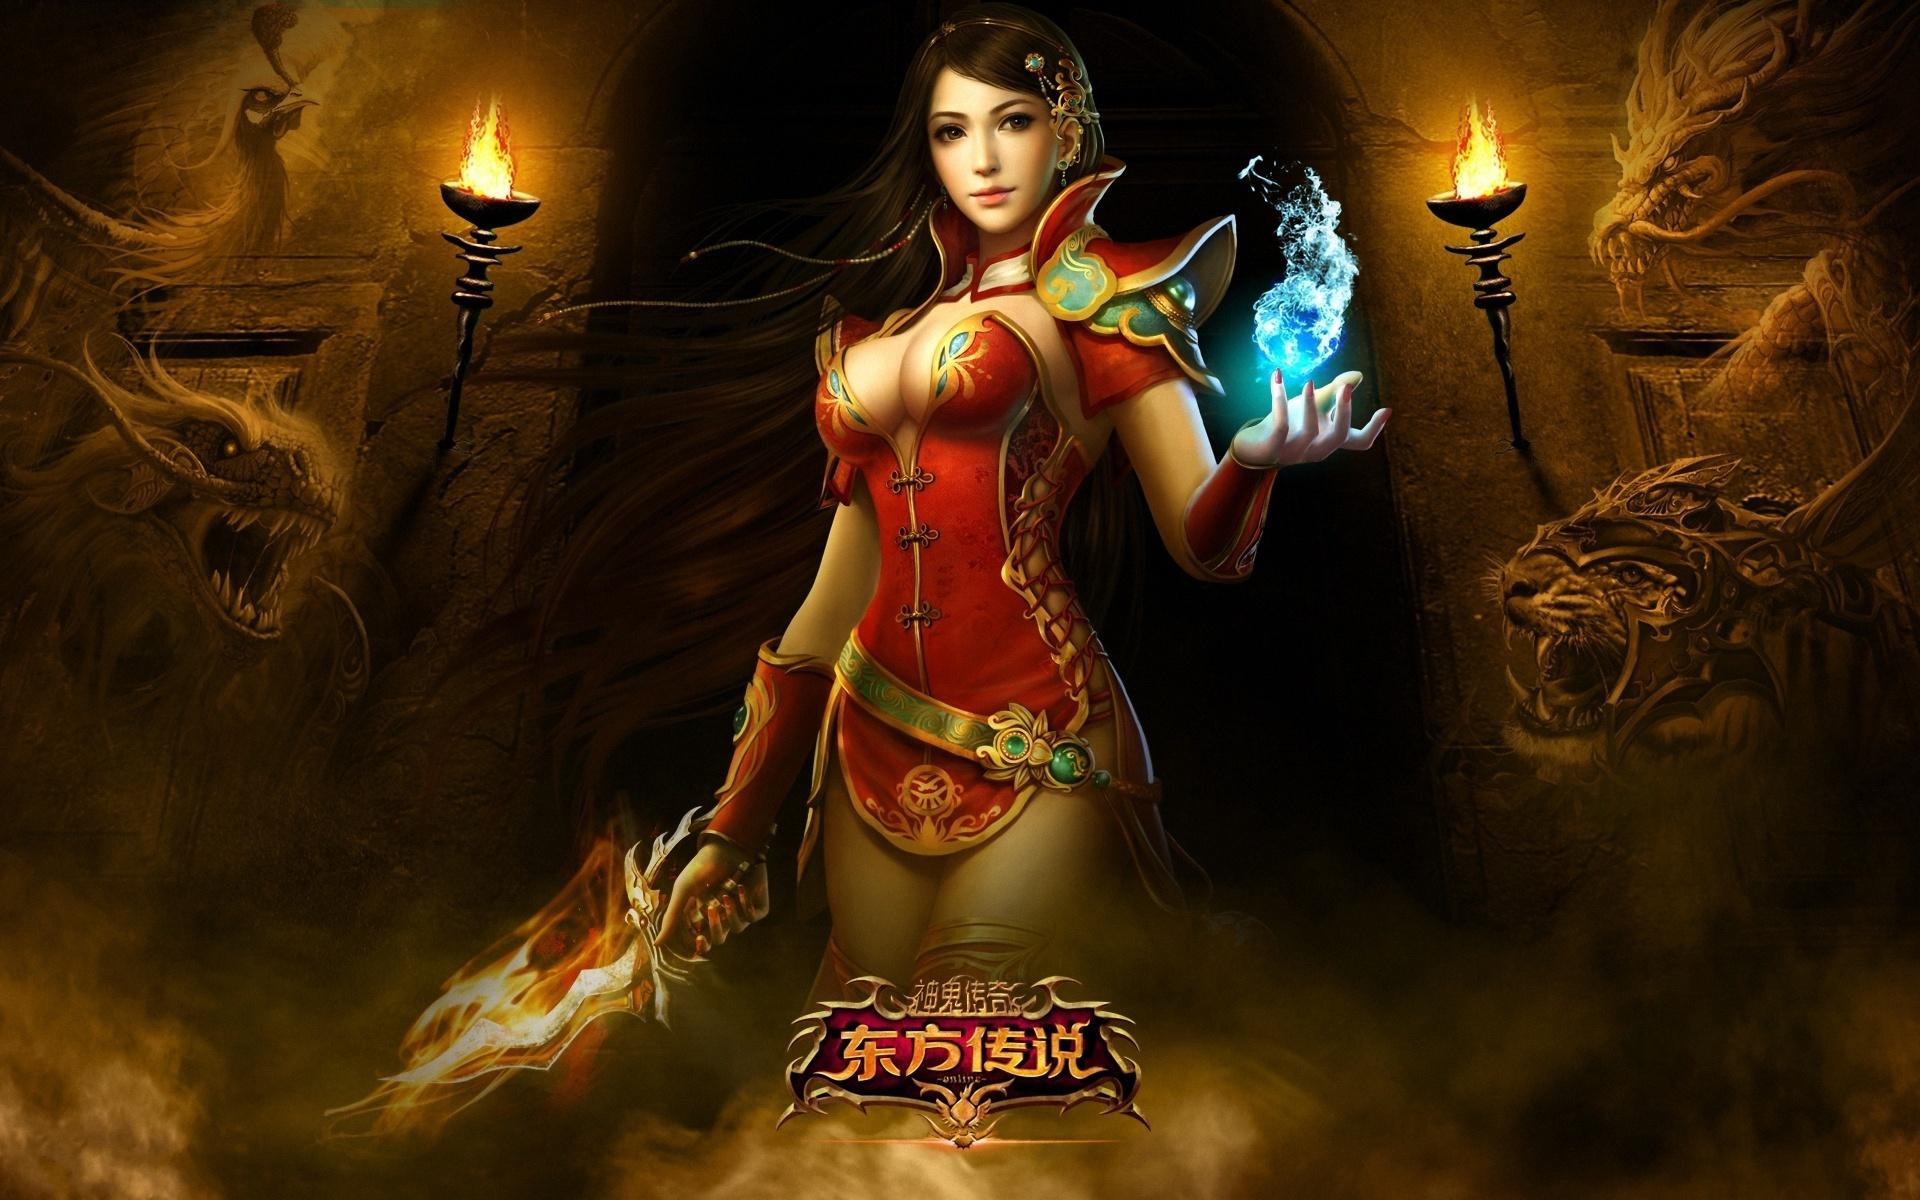 Wallpaper Oriental Legend Of The Game Beautiful Girl 1920x1200 Hd